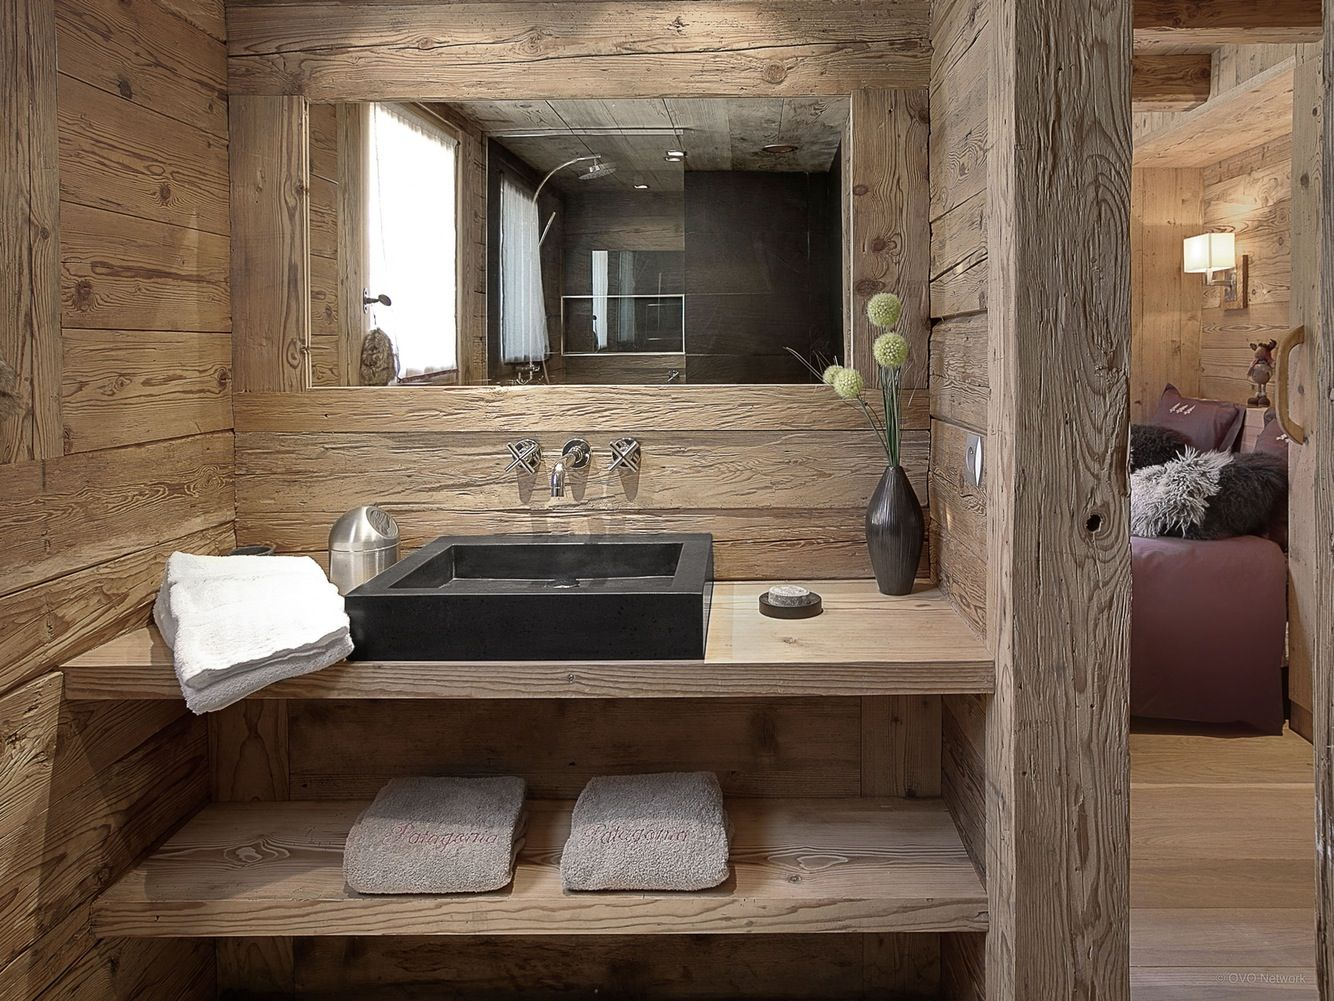 Pin by Emily Conley on Mountain Modern | Chalet, Salle de bains ...